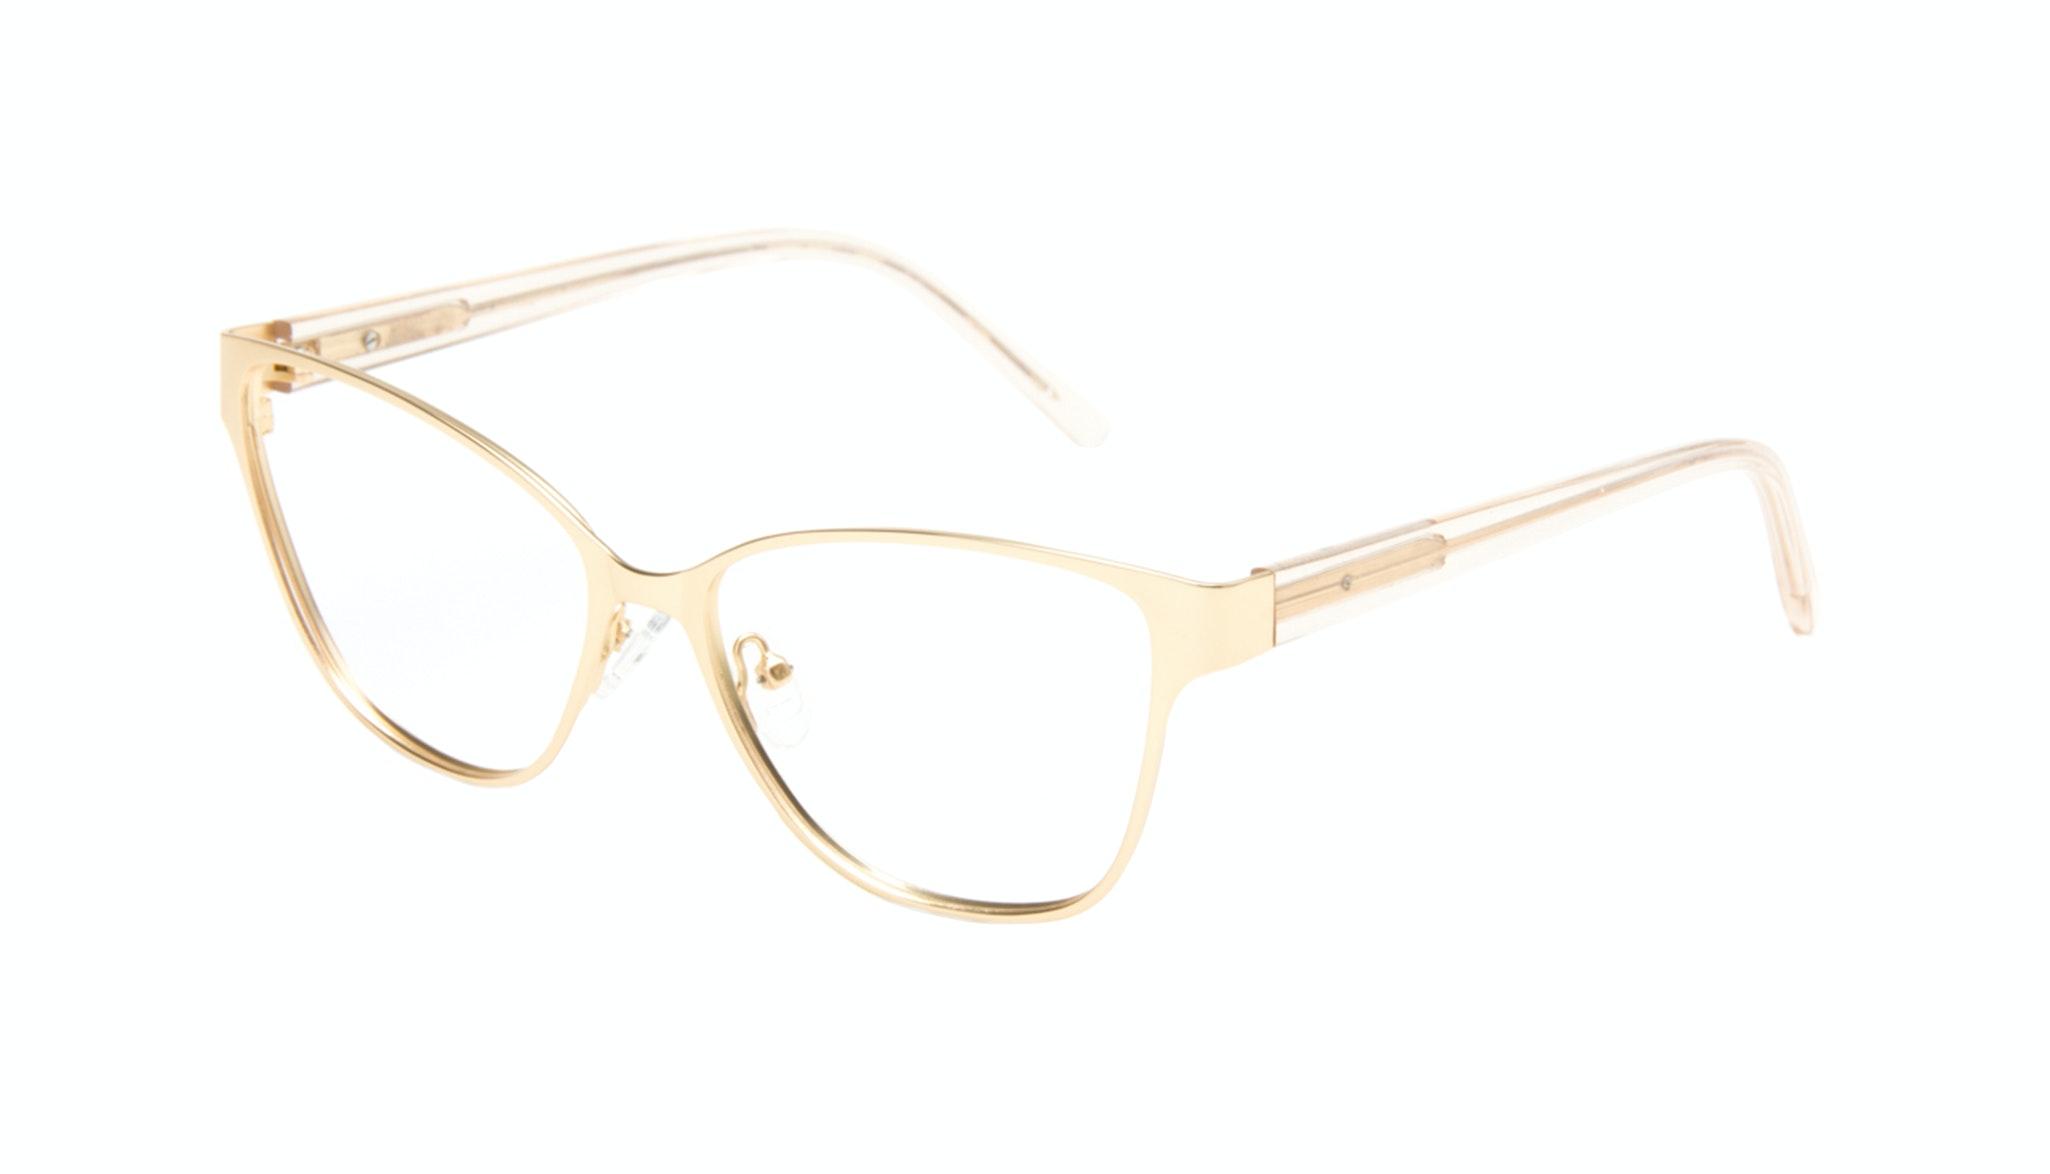 Affordable Fashion Glasses Rectangle Eyeglasses Women Radiant Gold Tilt